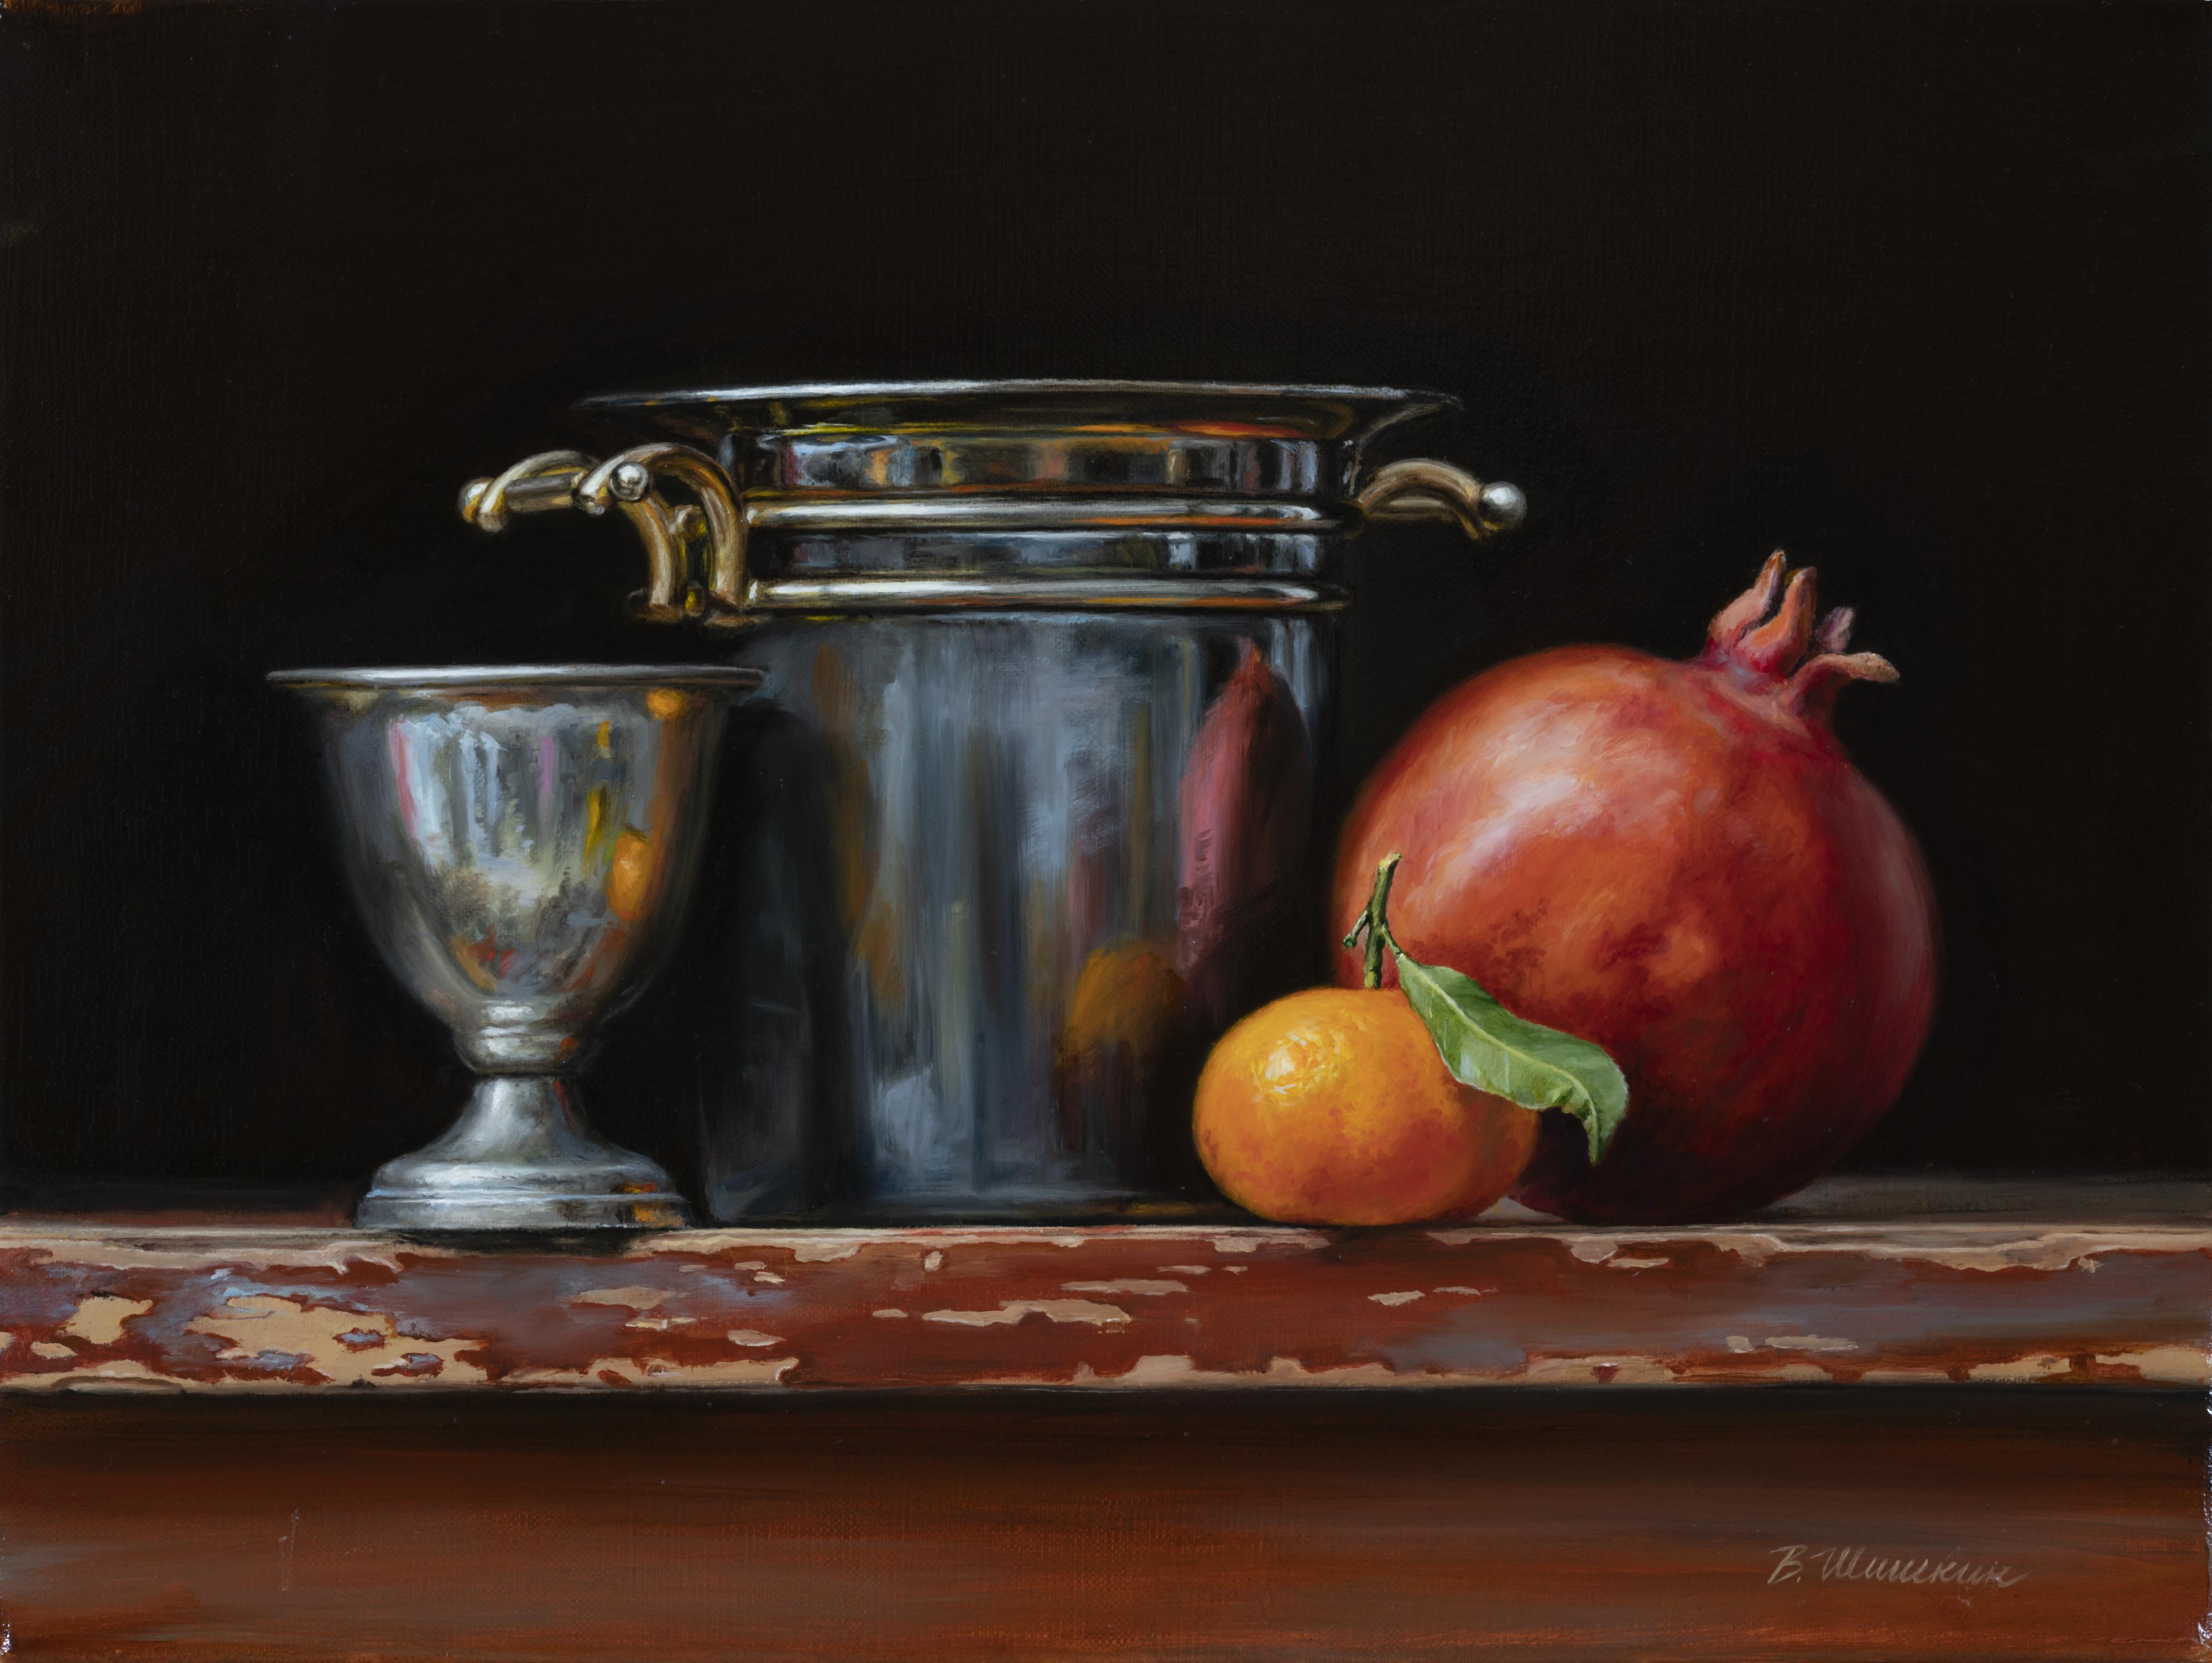 Pomegranate and tangerine